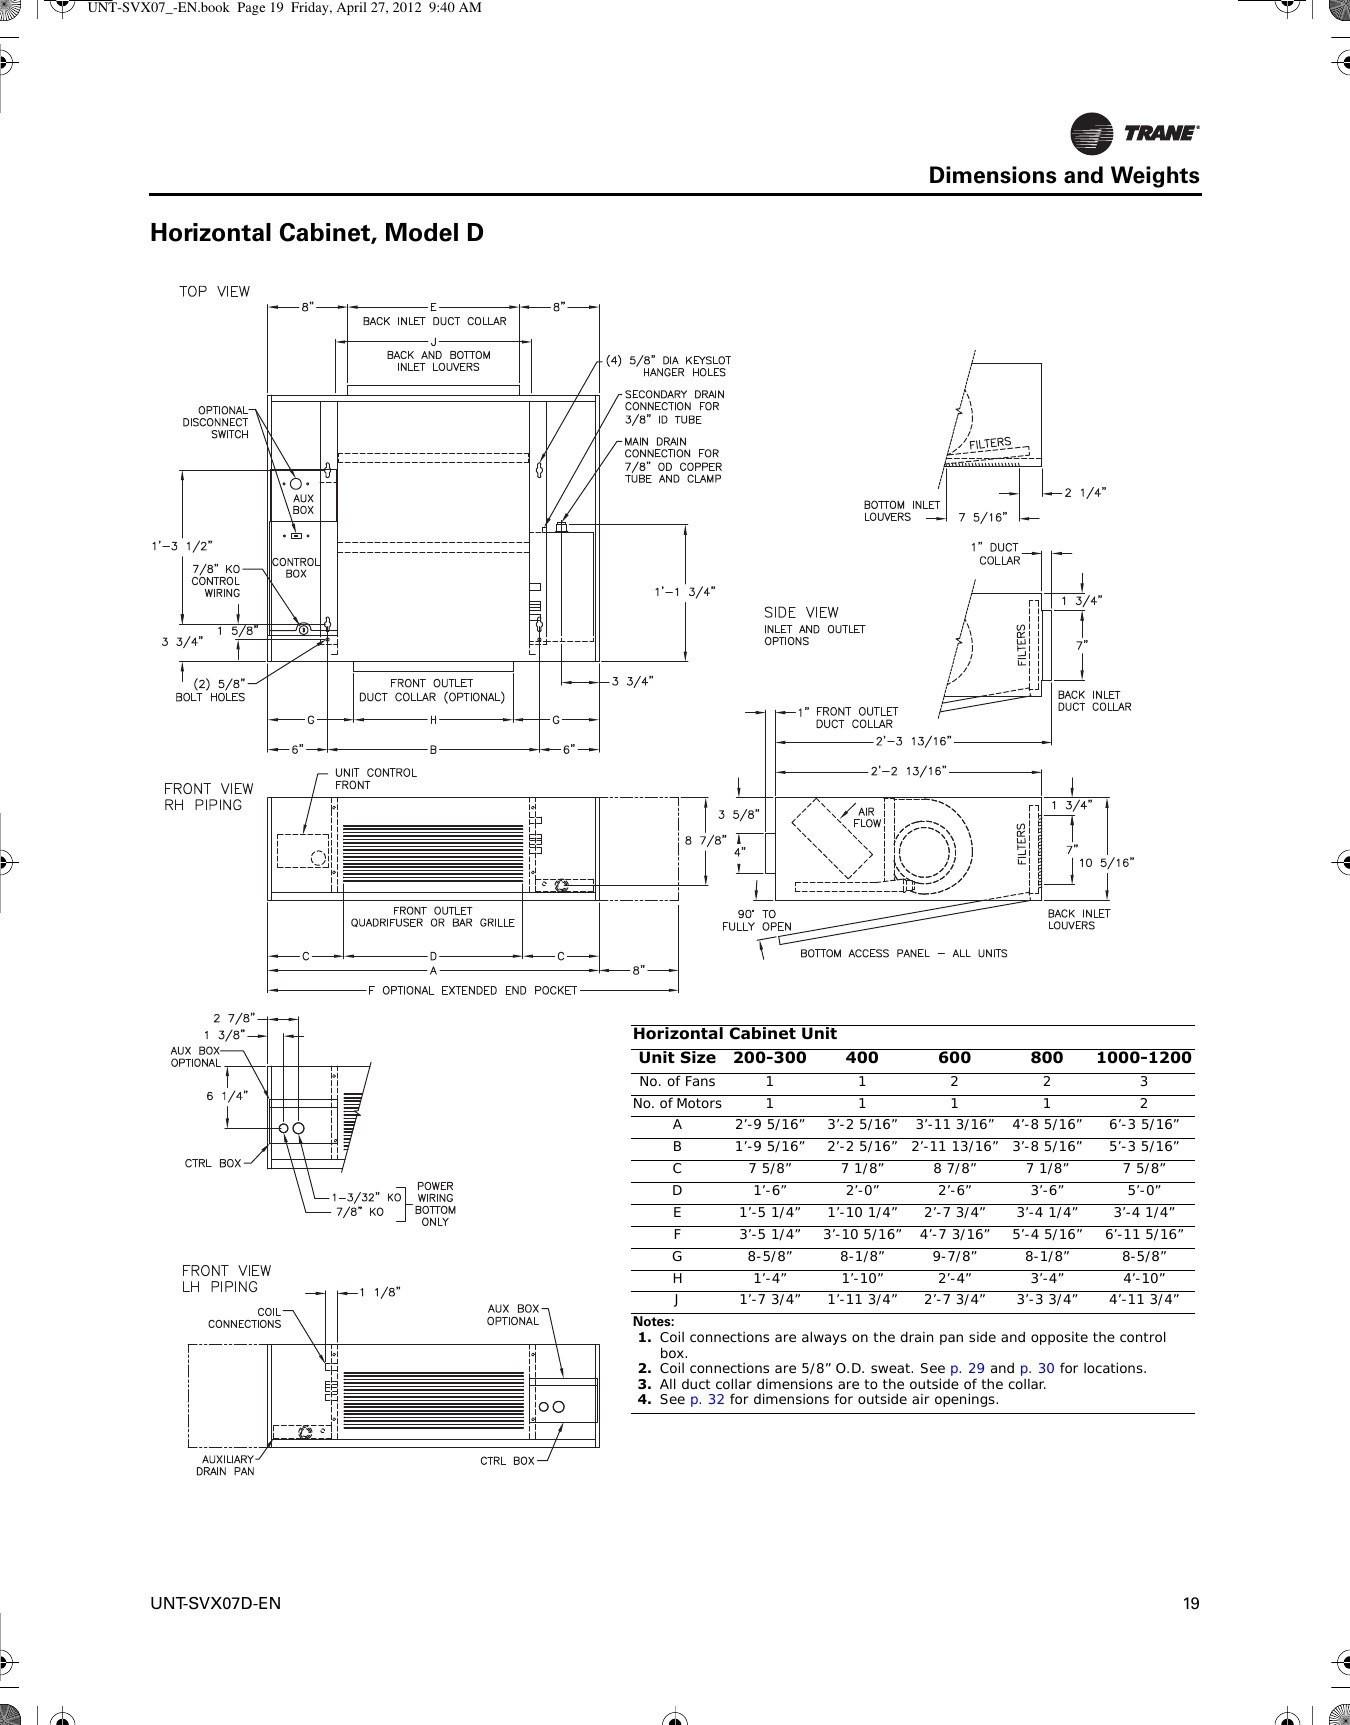 hight resolution of pollak 12 705 blade wiring diagram wiring library rh 8 boptions1 de 7 pin trailer connector pinout 7 pin trailer connector pinout